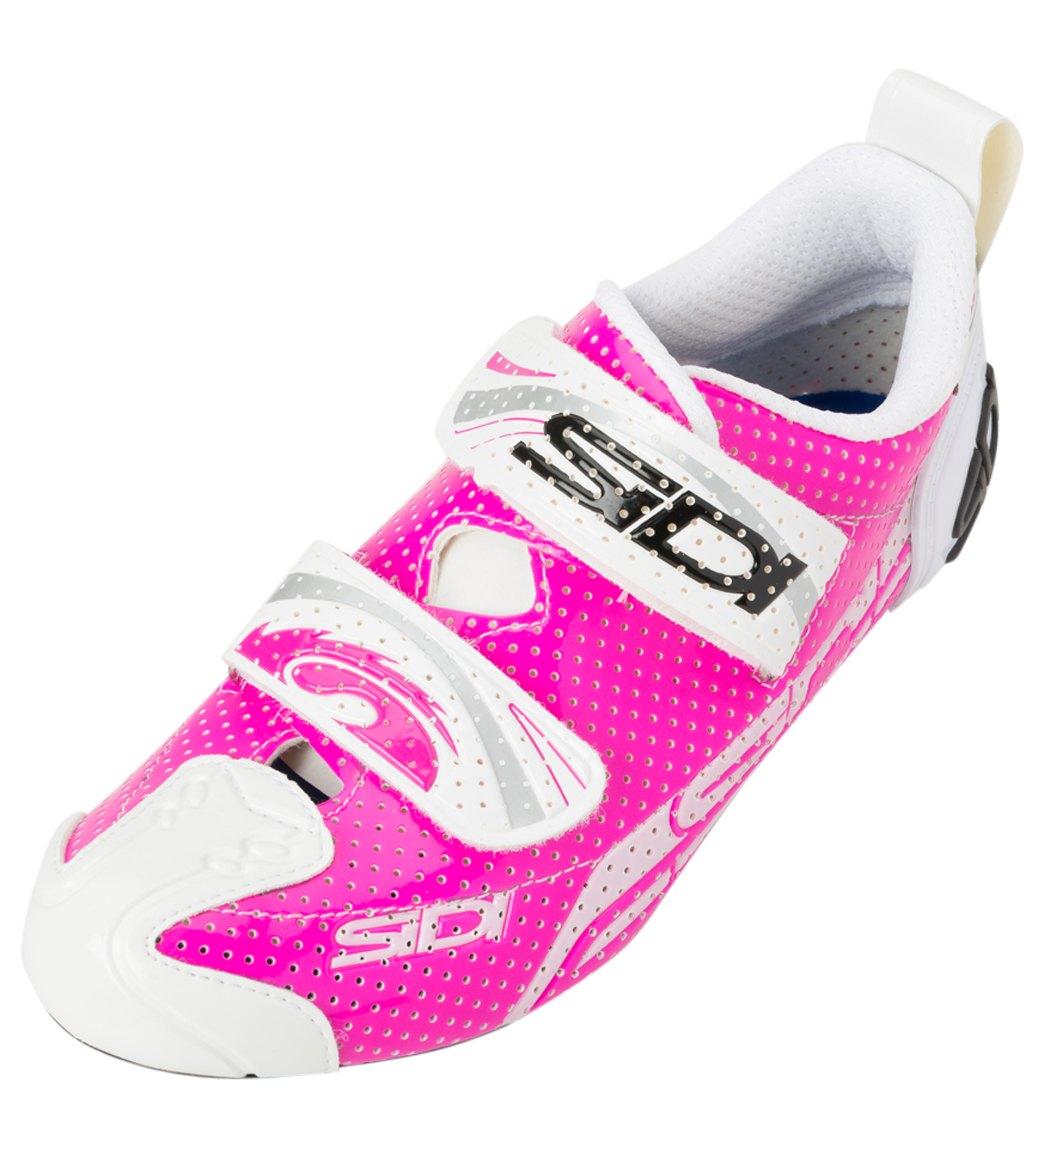 SIDI Women s T4 Air Carbon Tri Cycling Shoes at SwimOutlet.com - Free  Shipping 034c62de9